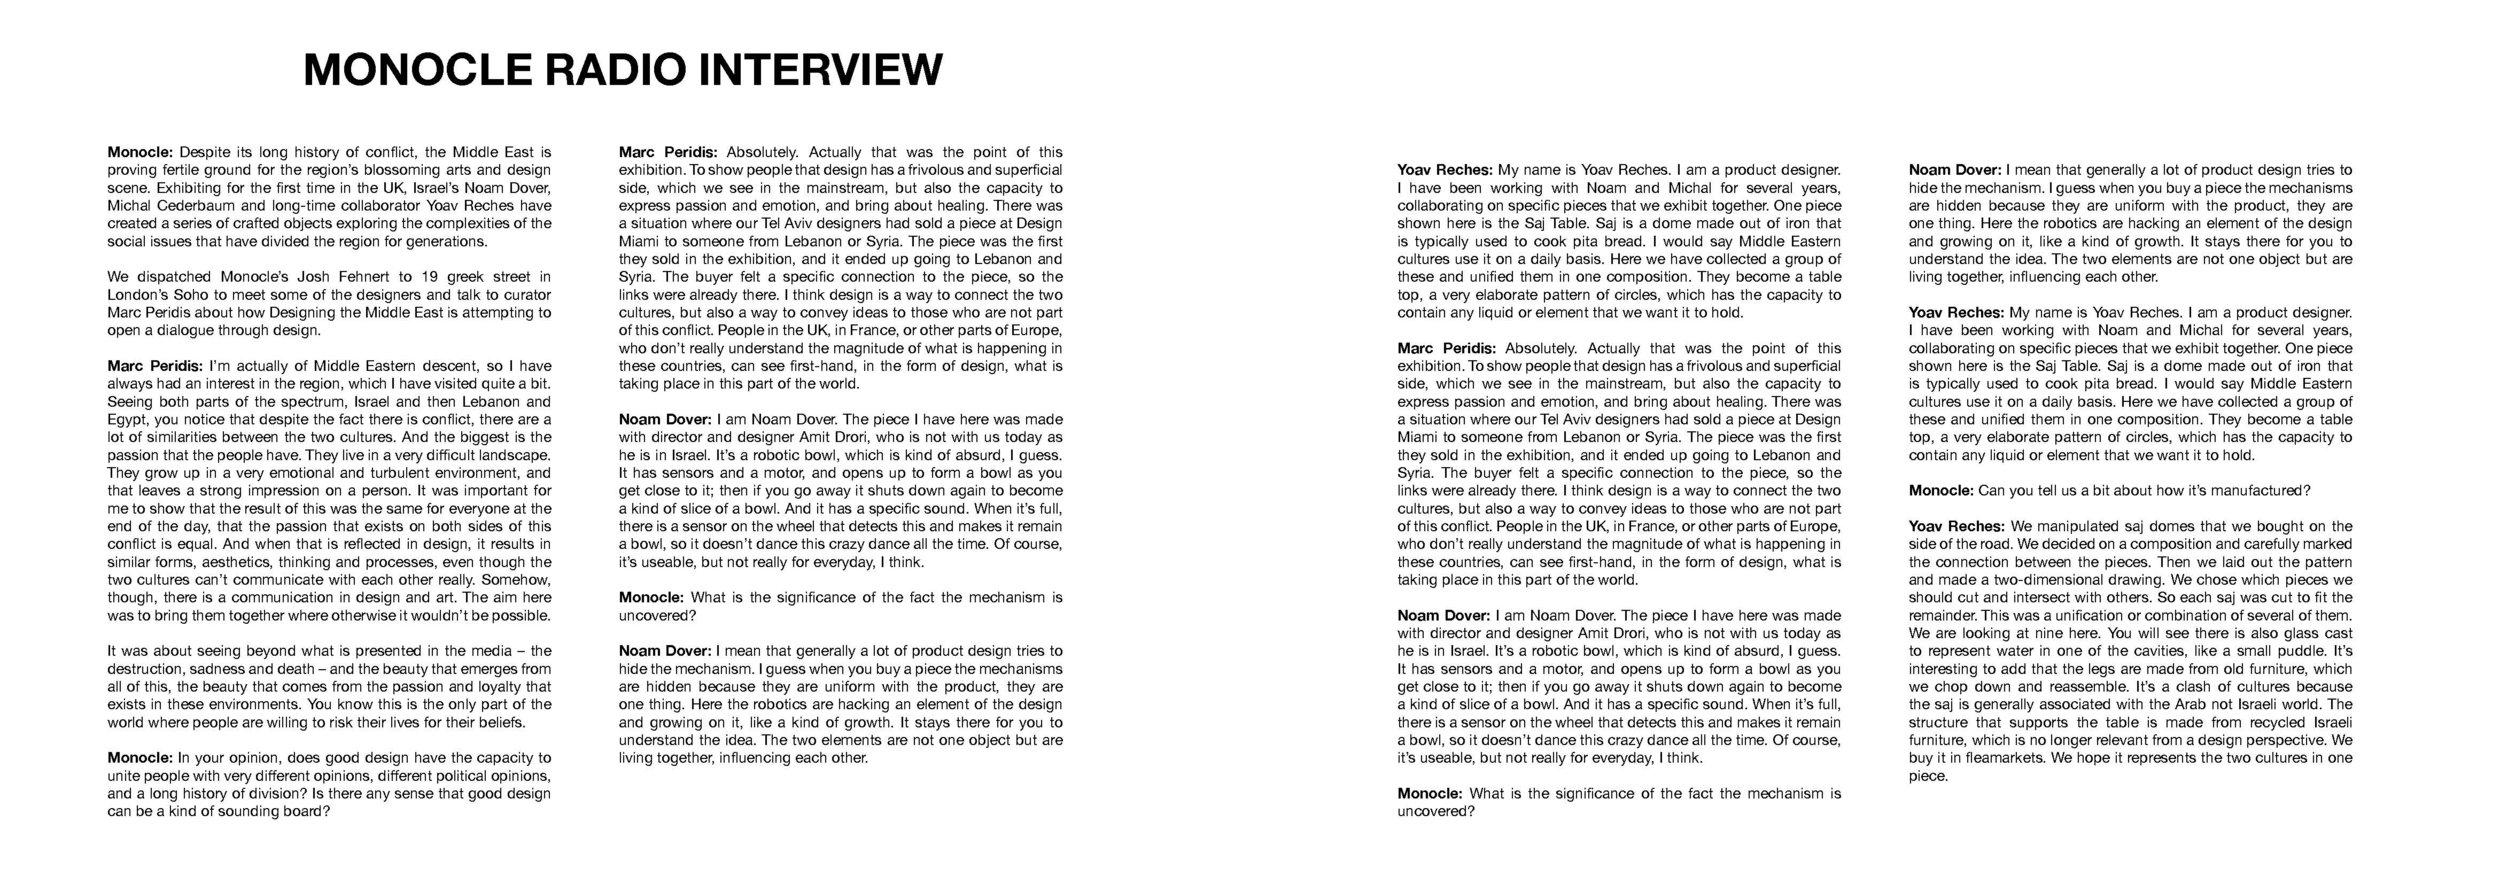 MANIFESTO MASTER FILE 221214 _Page_105.jpg